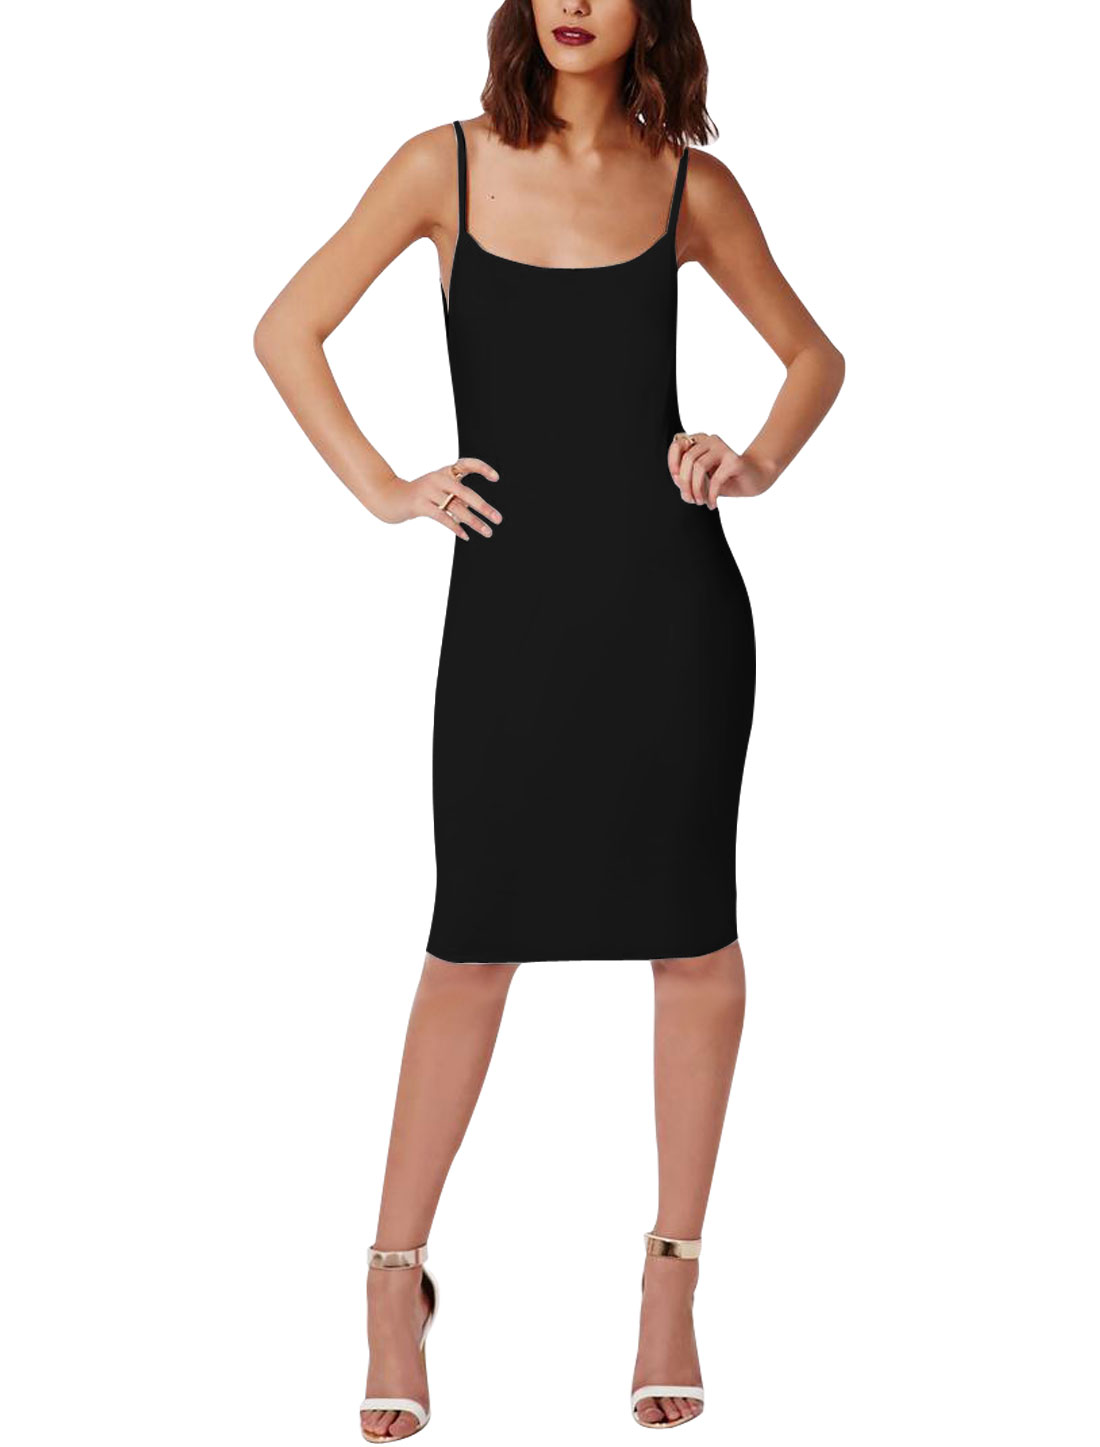 Women Scoop Neck Backless Sleeveless Pencil Dress Black M